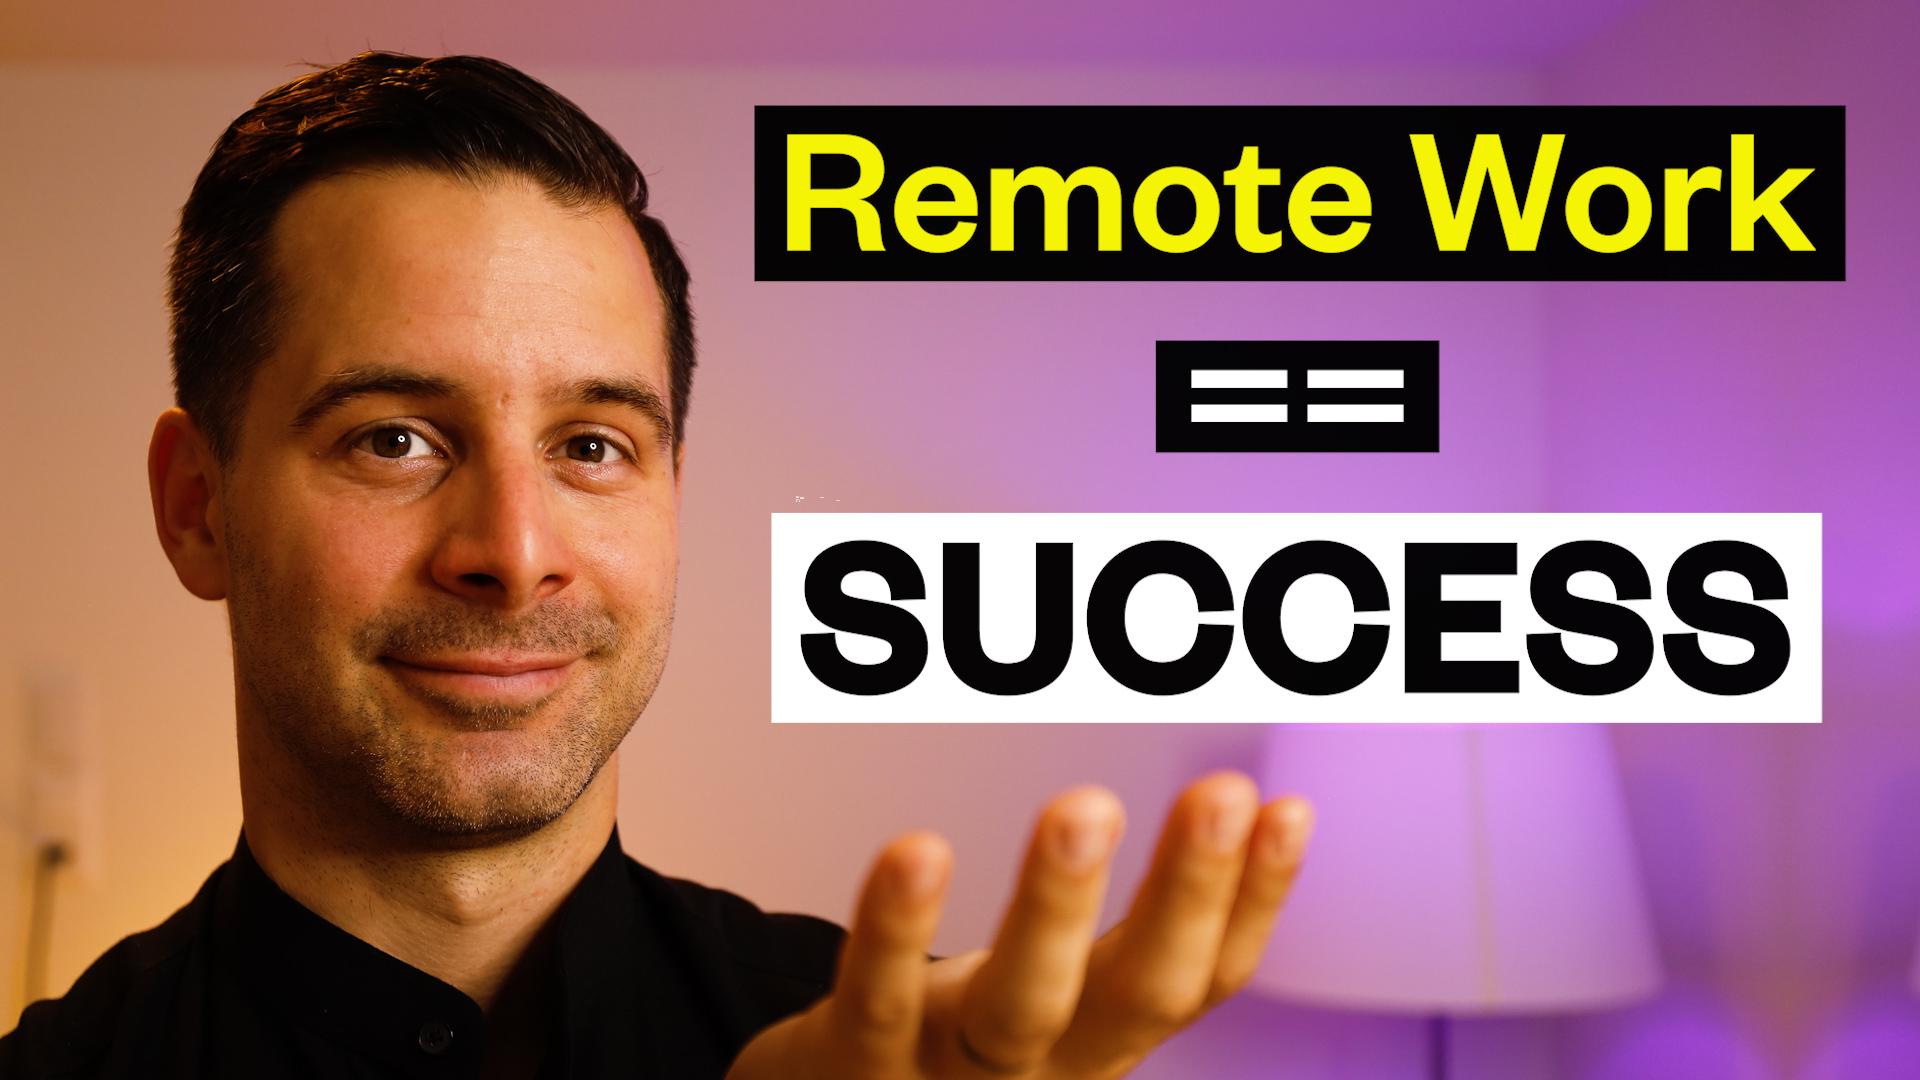 Remote Work == Success